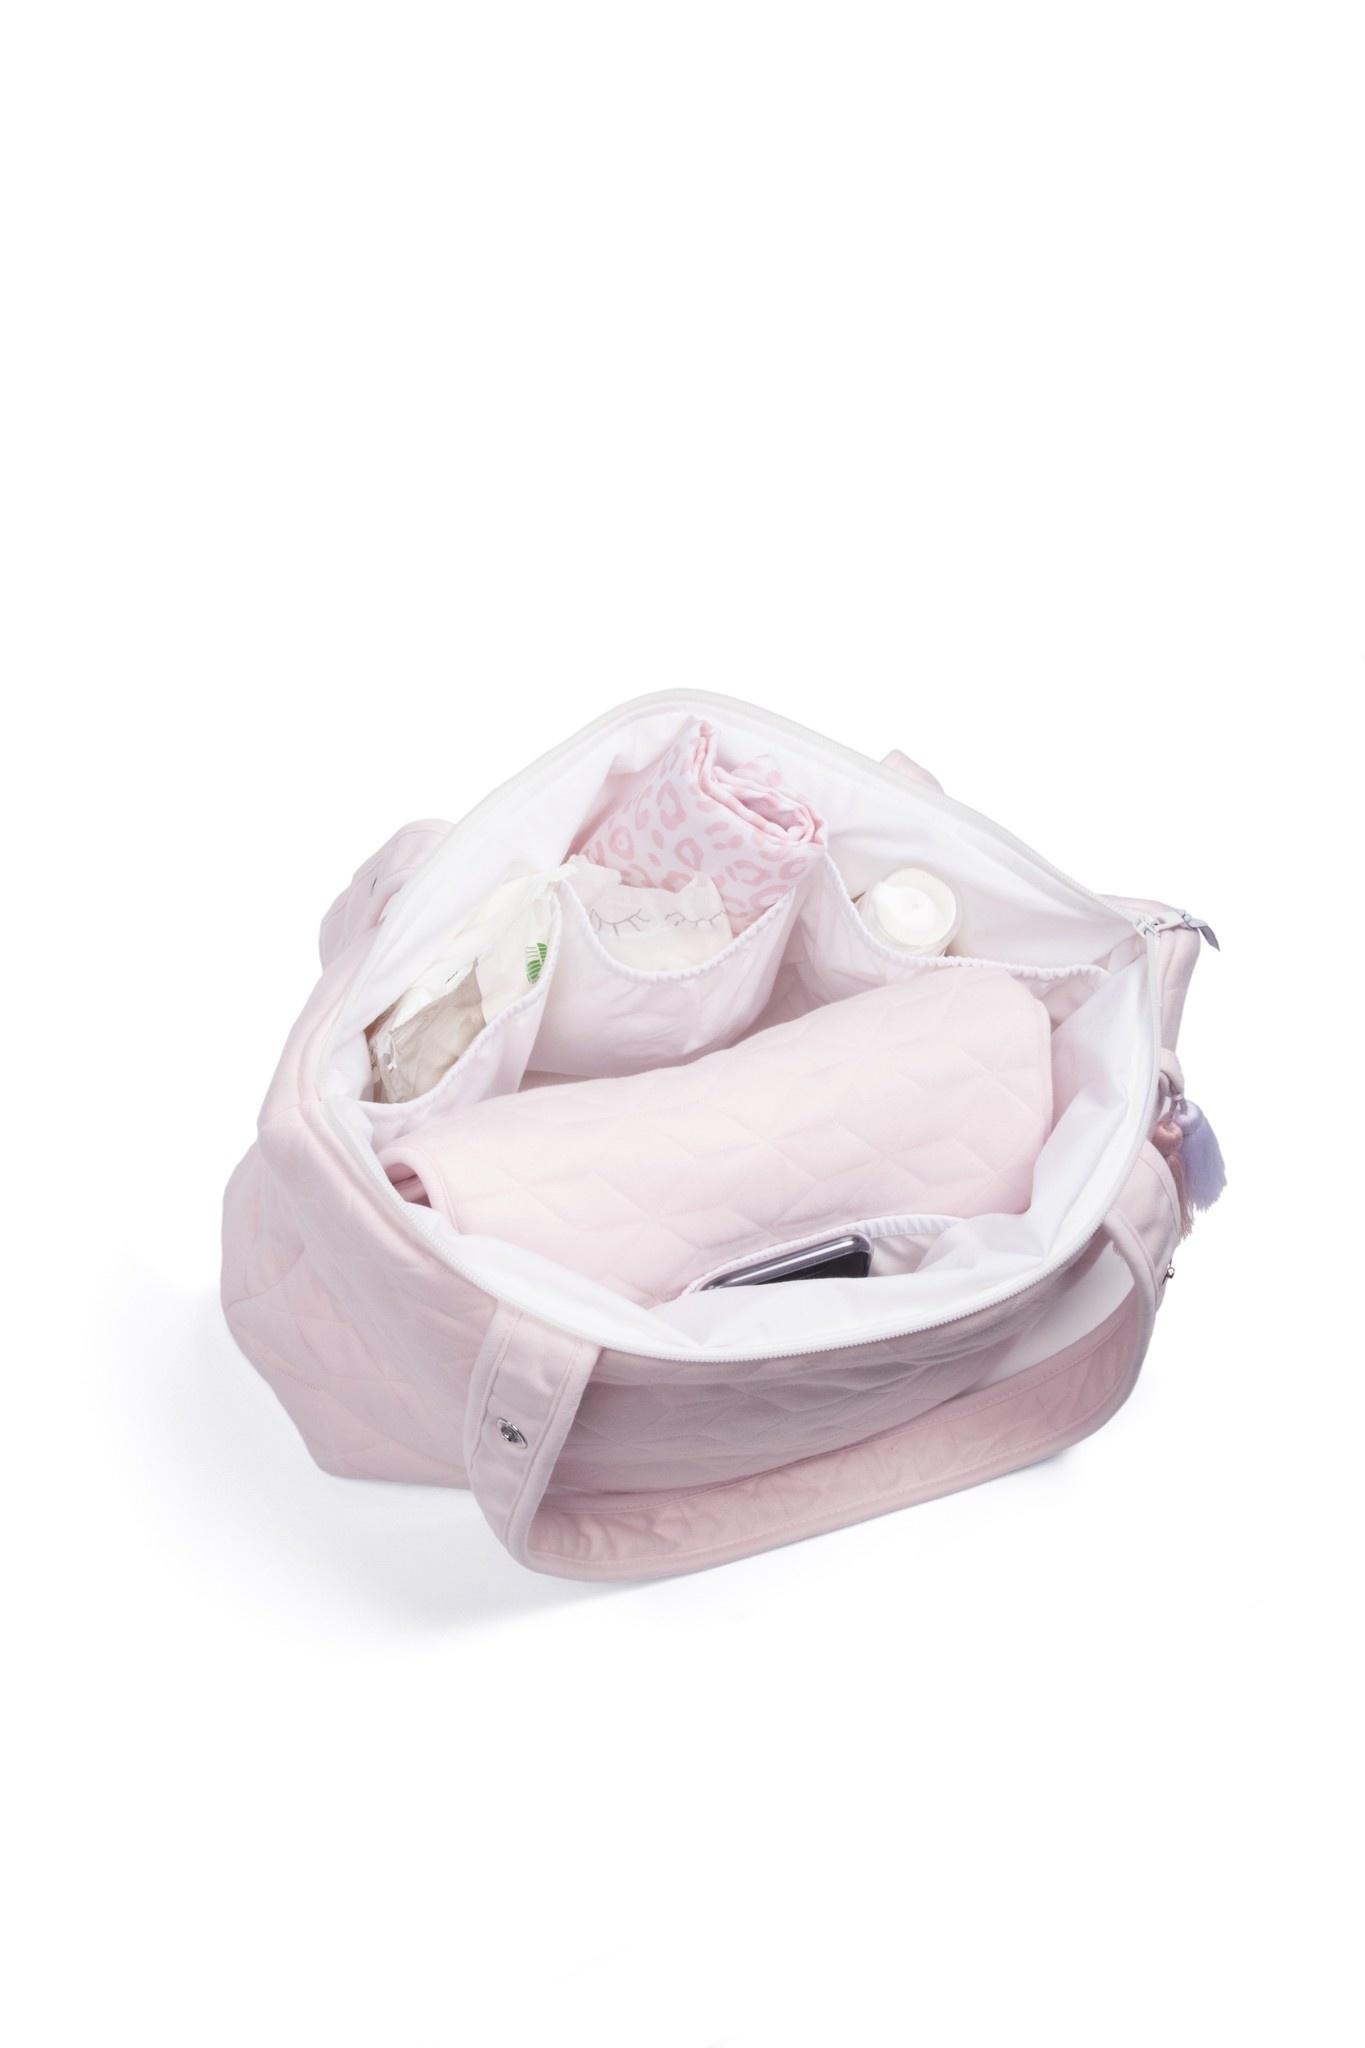 Portable changingmat Star Soft Pink-6